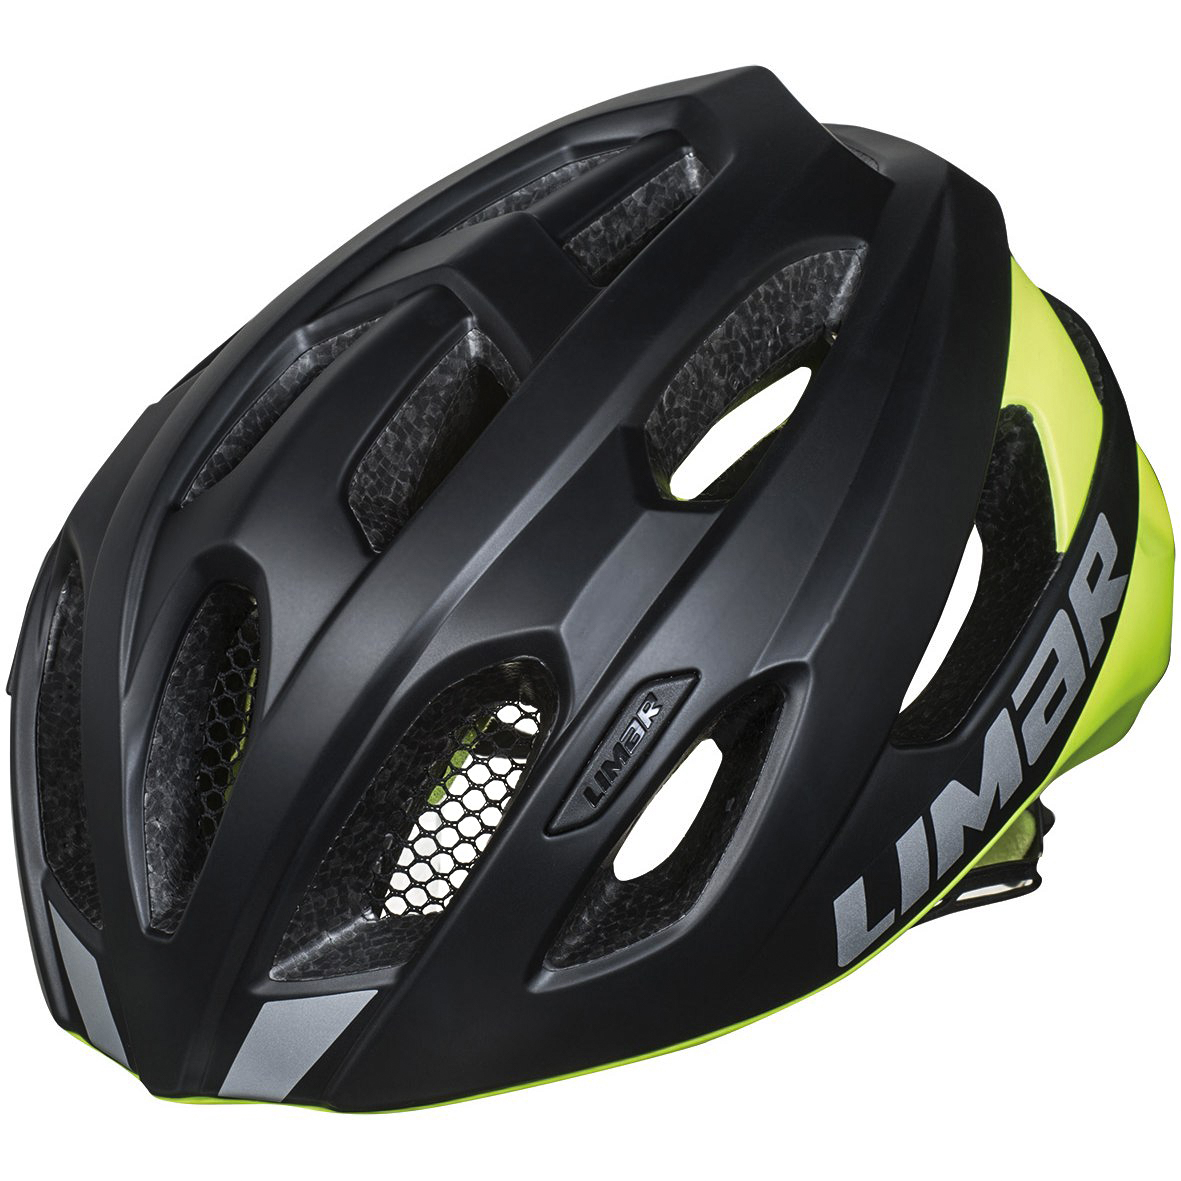 Limar 797 e-bike reflective matt black 2018 Velikost: M (53-57 cm)